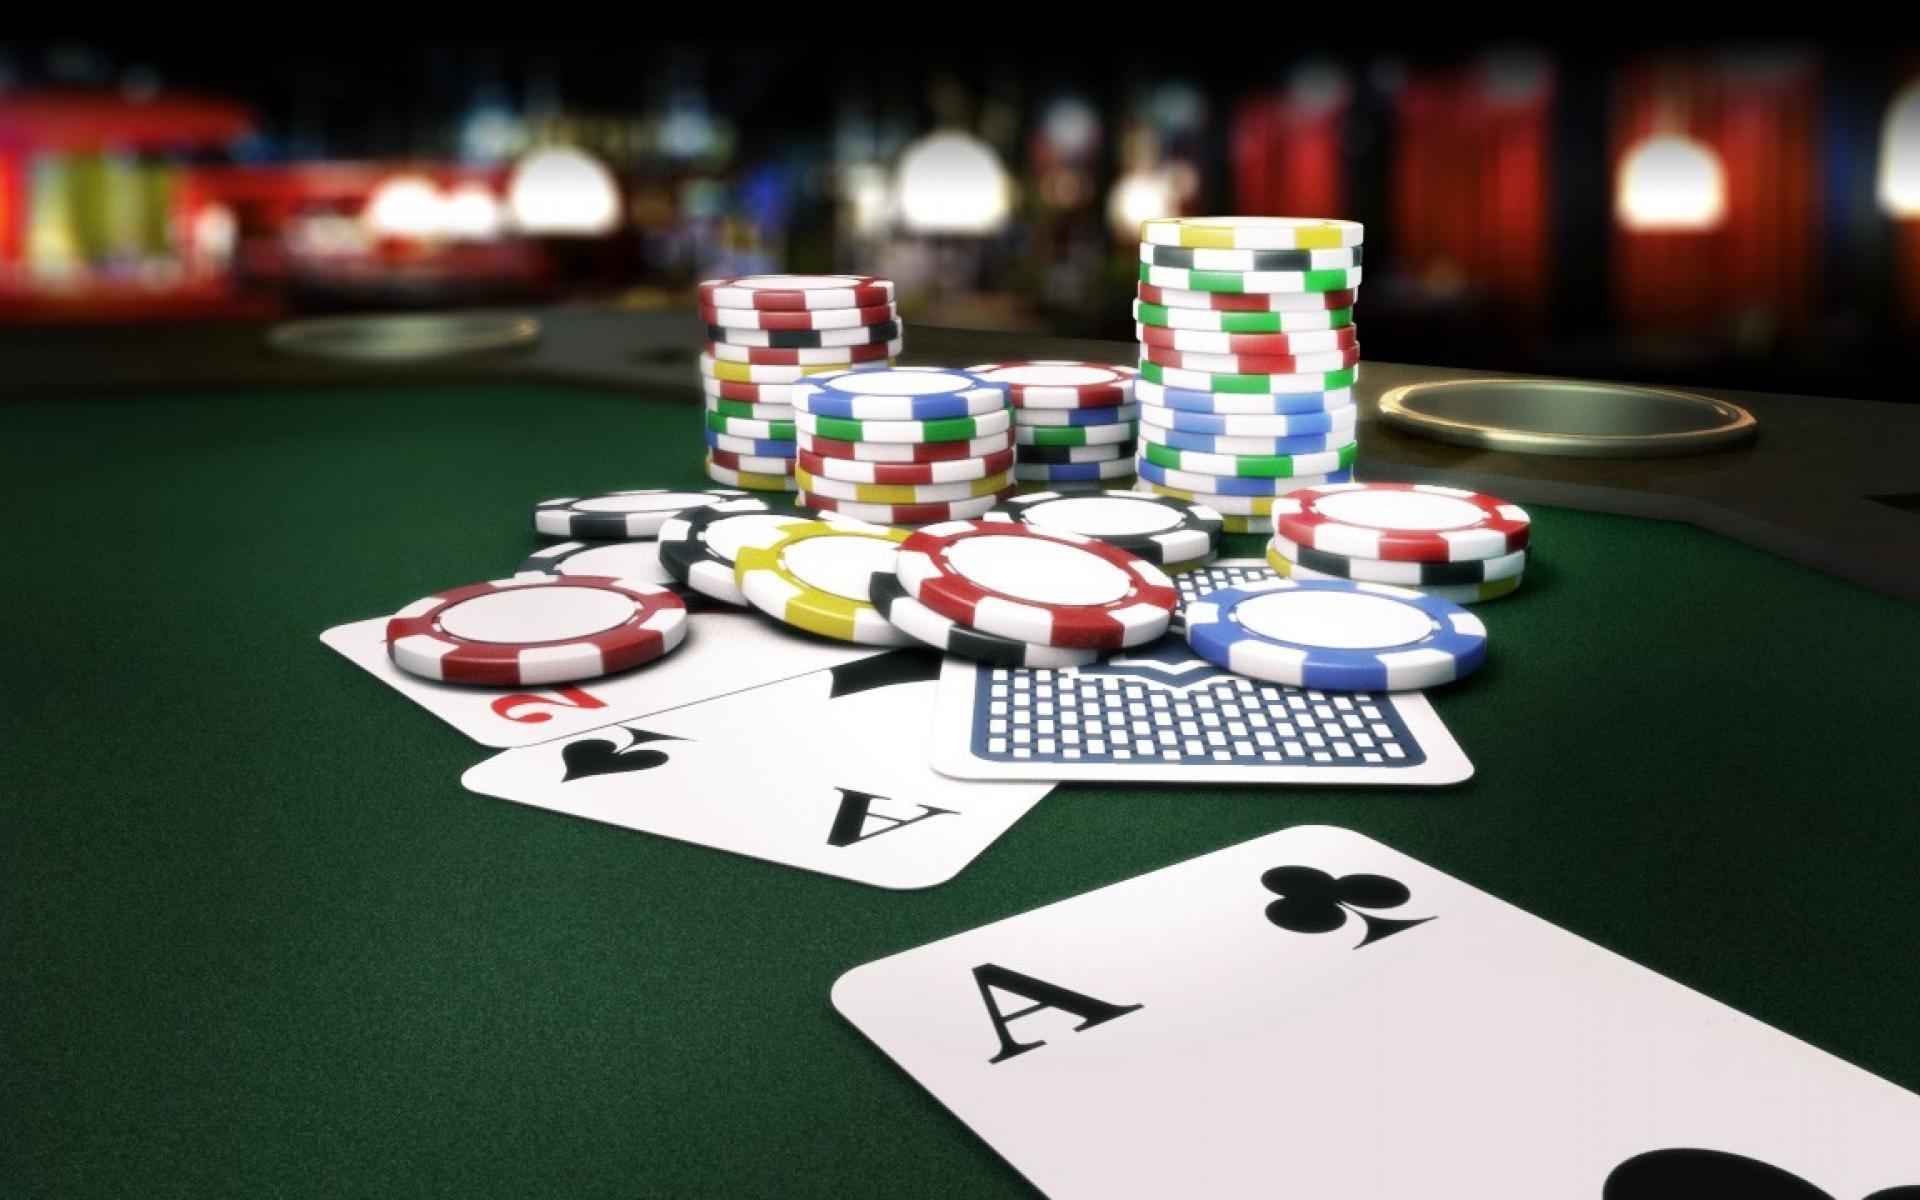 Poker Wallpaper Hd posted by Sarah Tremblay